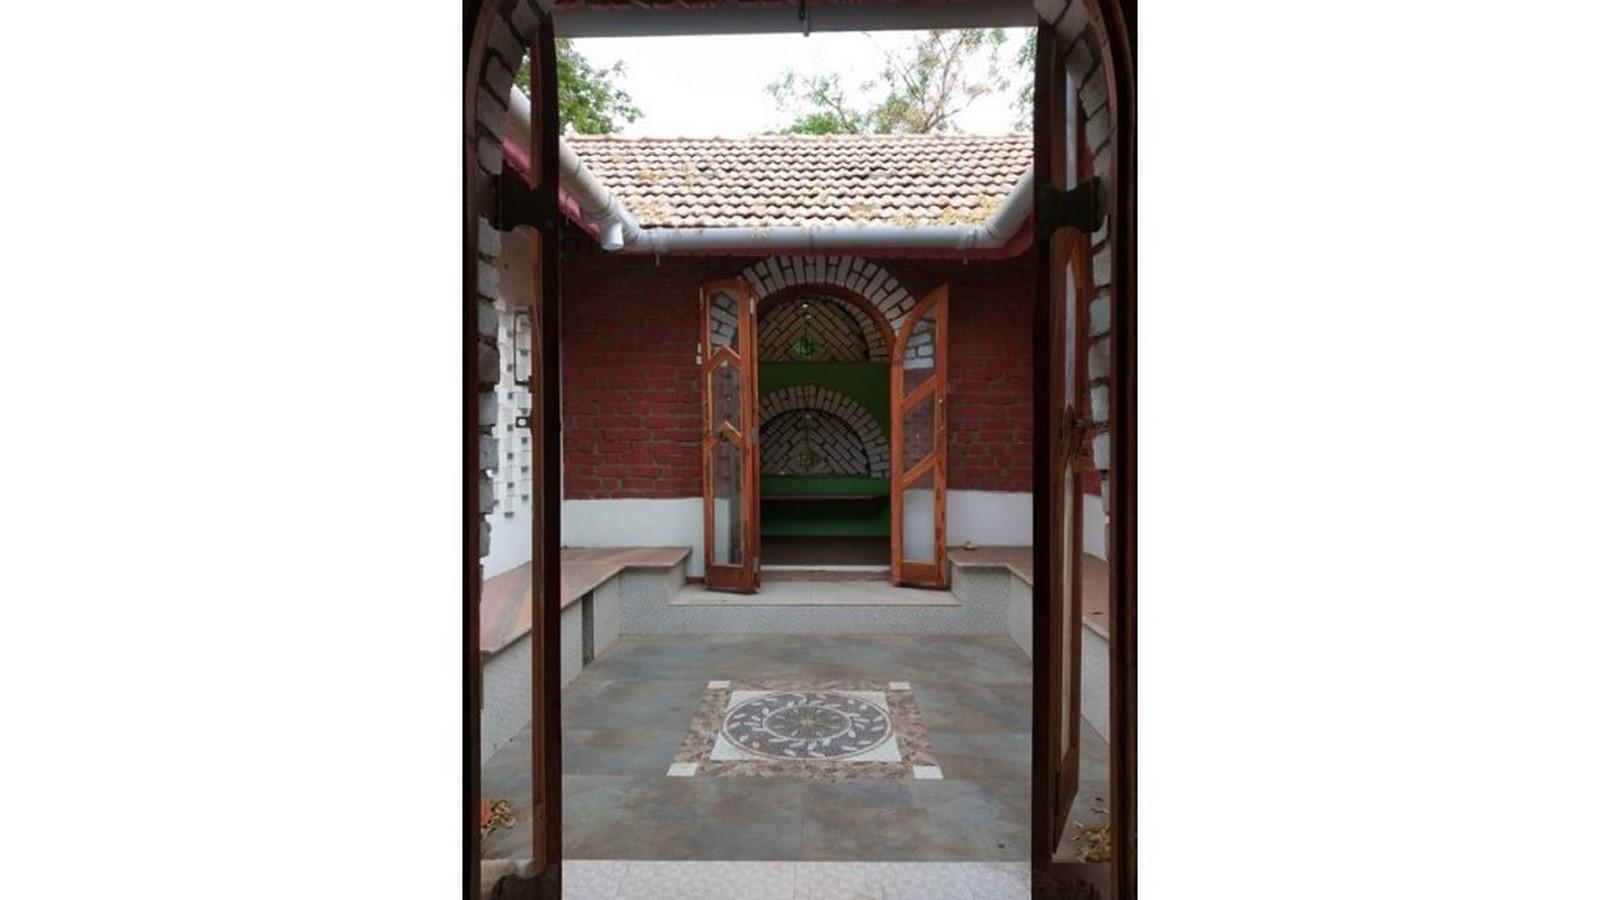 Design Jatra: Pioneering Sustainable Architecture of Regional India Sheet12